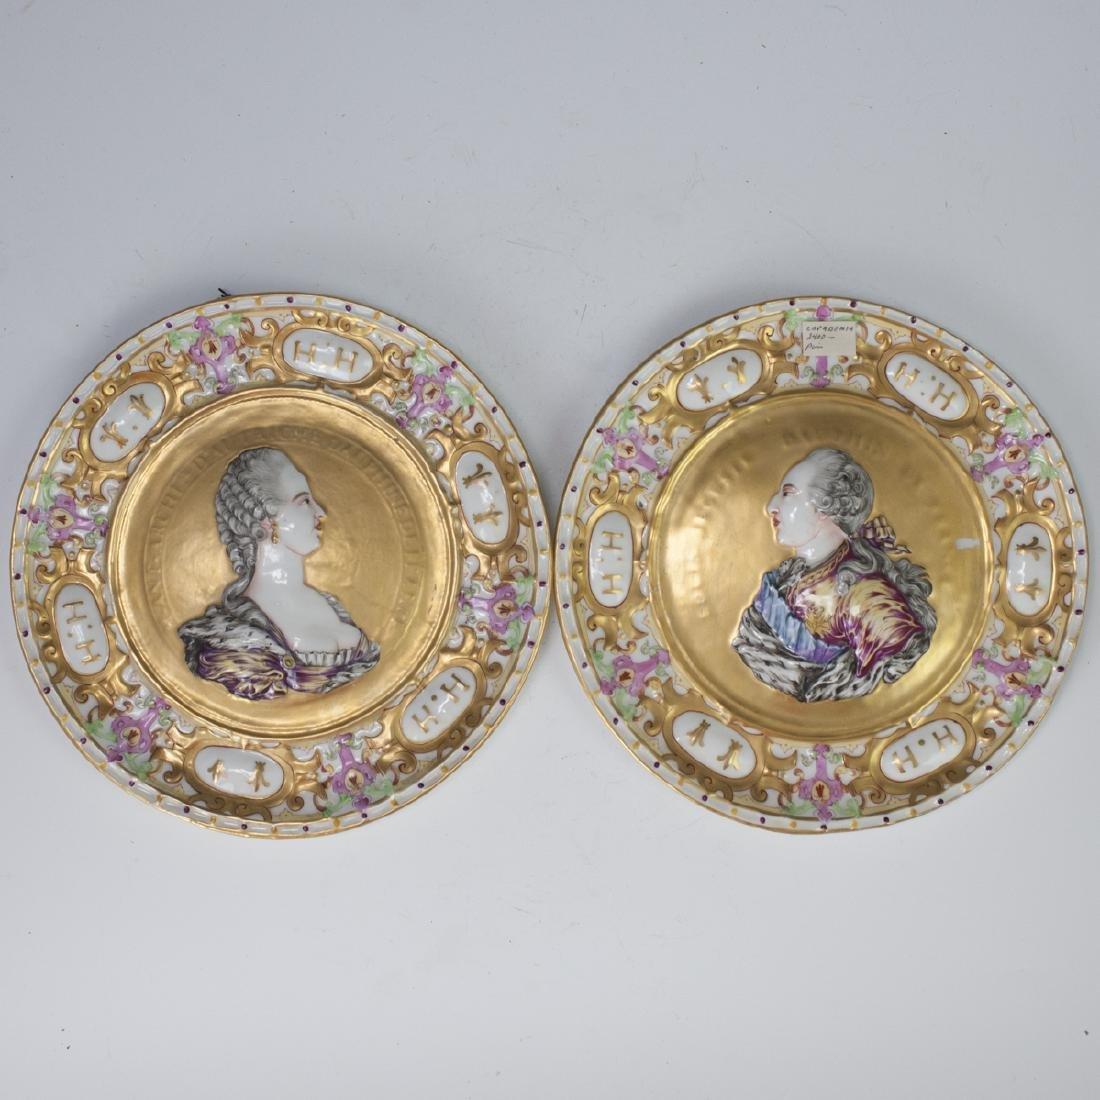 Antique Capodimonte Portrait Plates